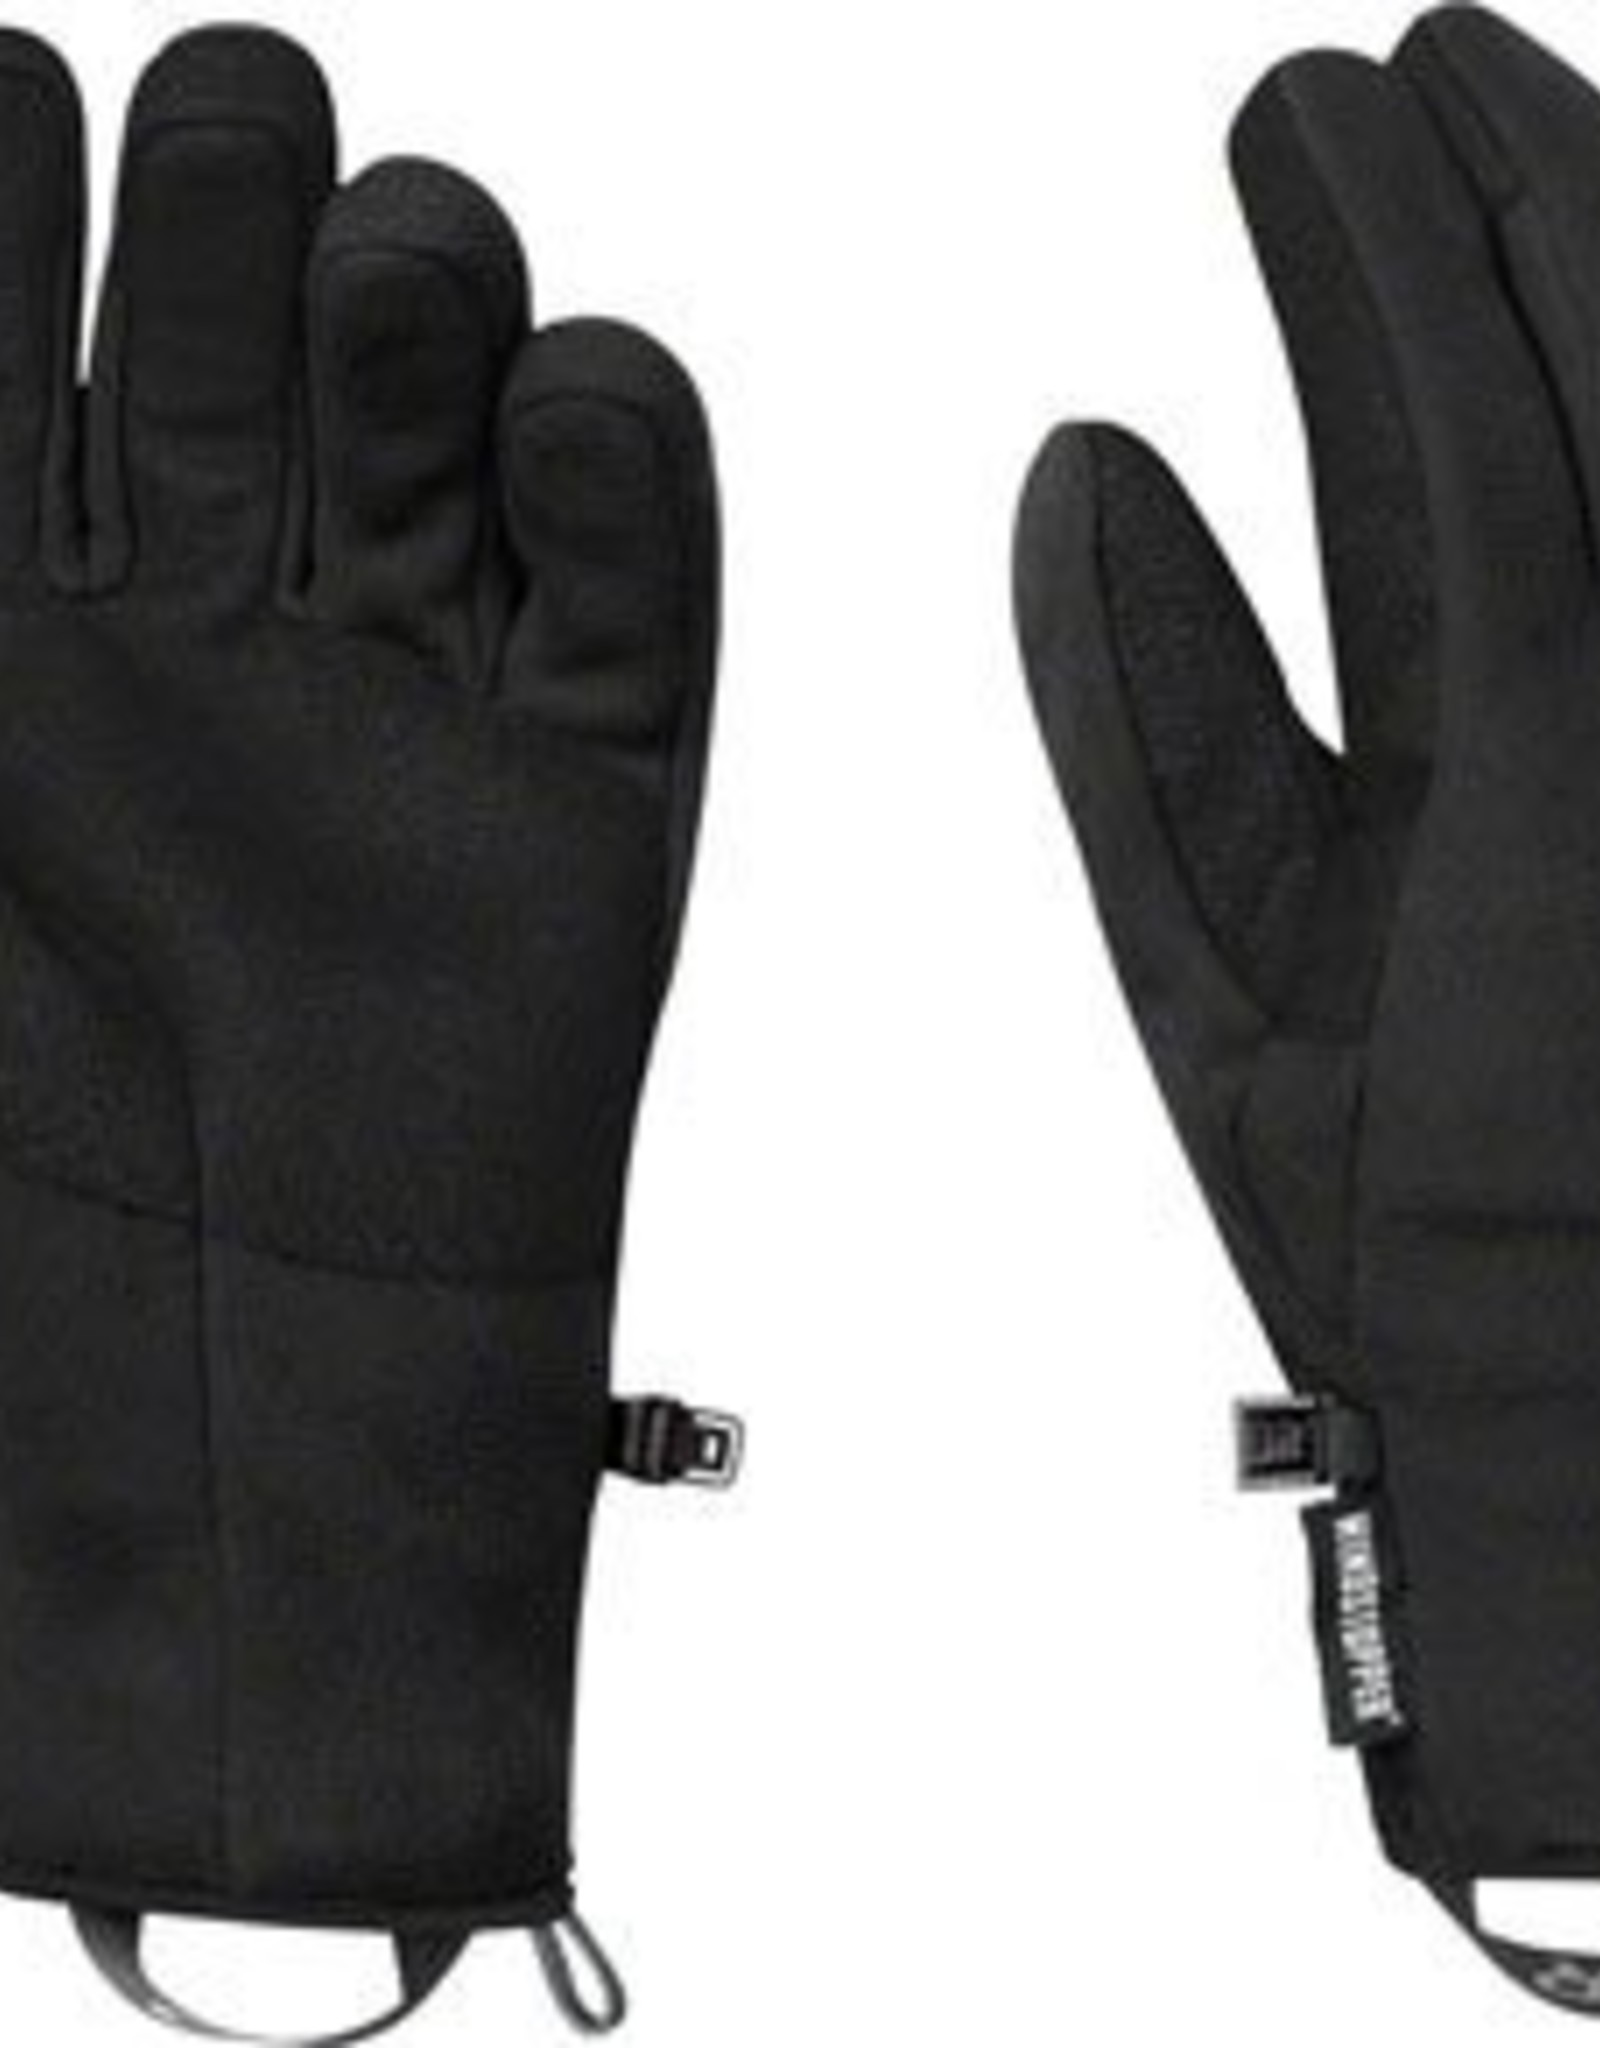 Outdoor Research Gripper Women's Gloves: Black, SM